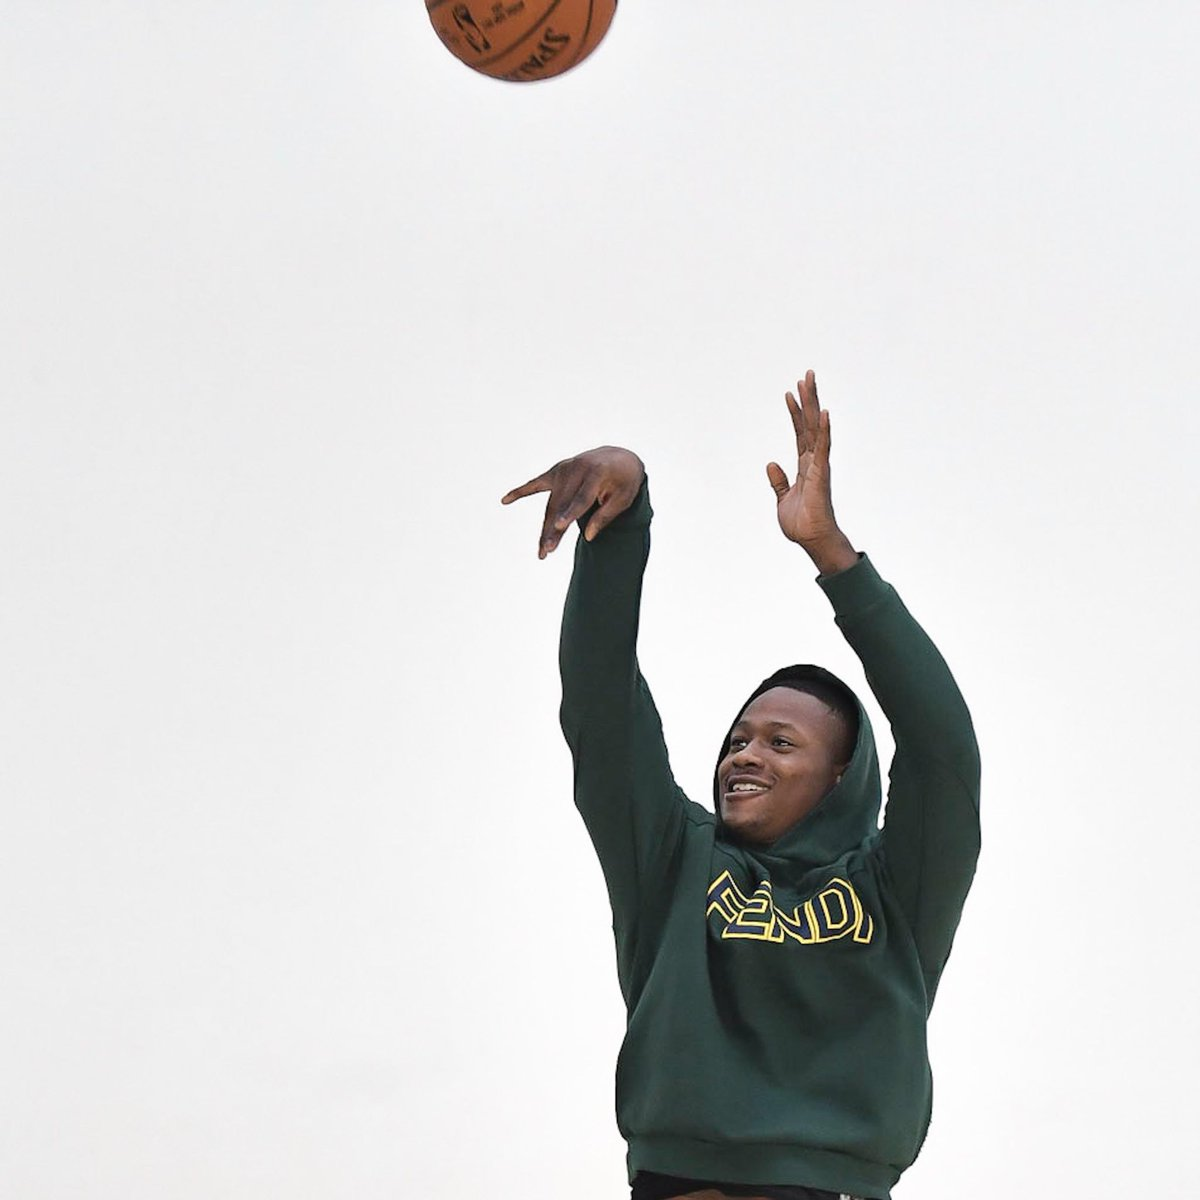 Morning shootaround in NYC 📍 https   t.co wis4ko7nG4 - Basketball ... 47120e4f9